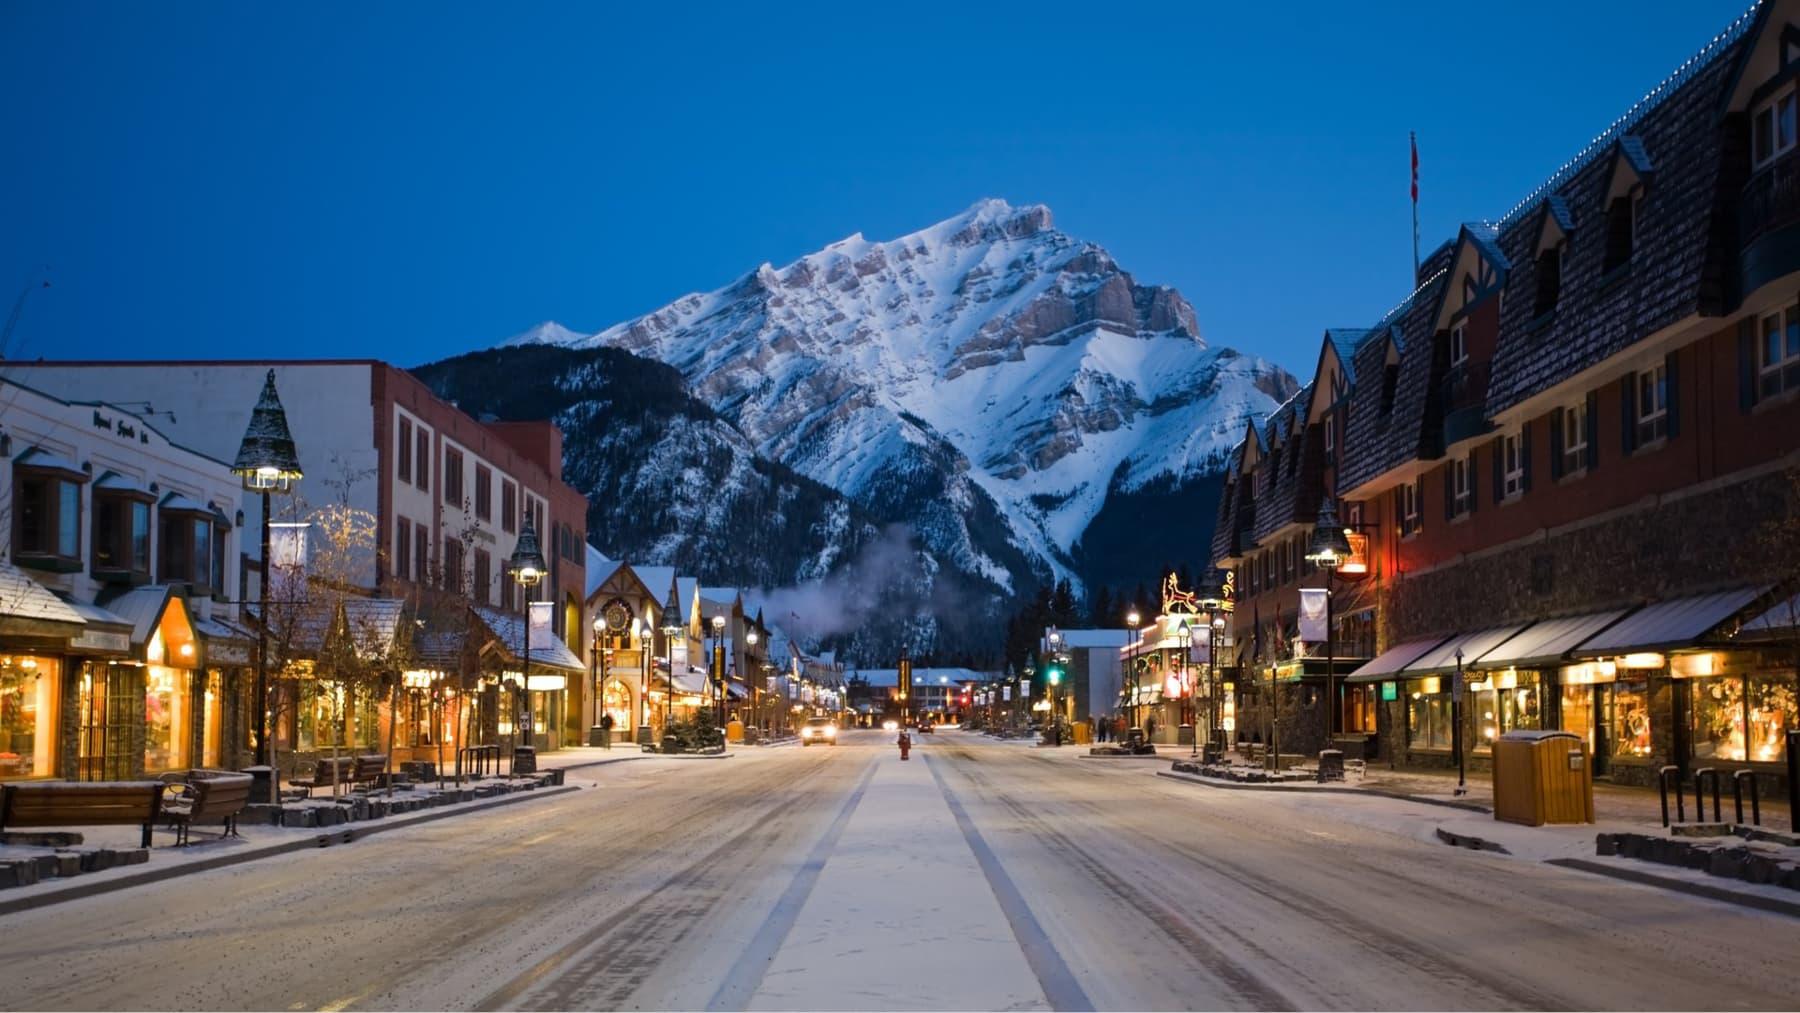 View towards Cascade Mountain from Banff avenue